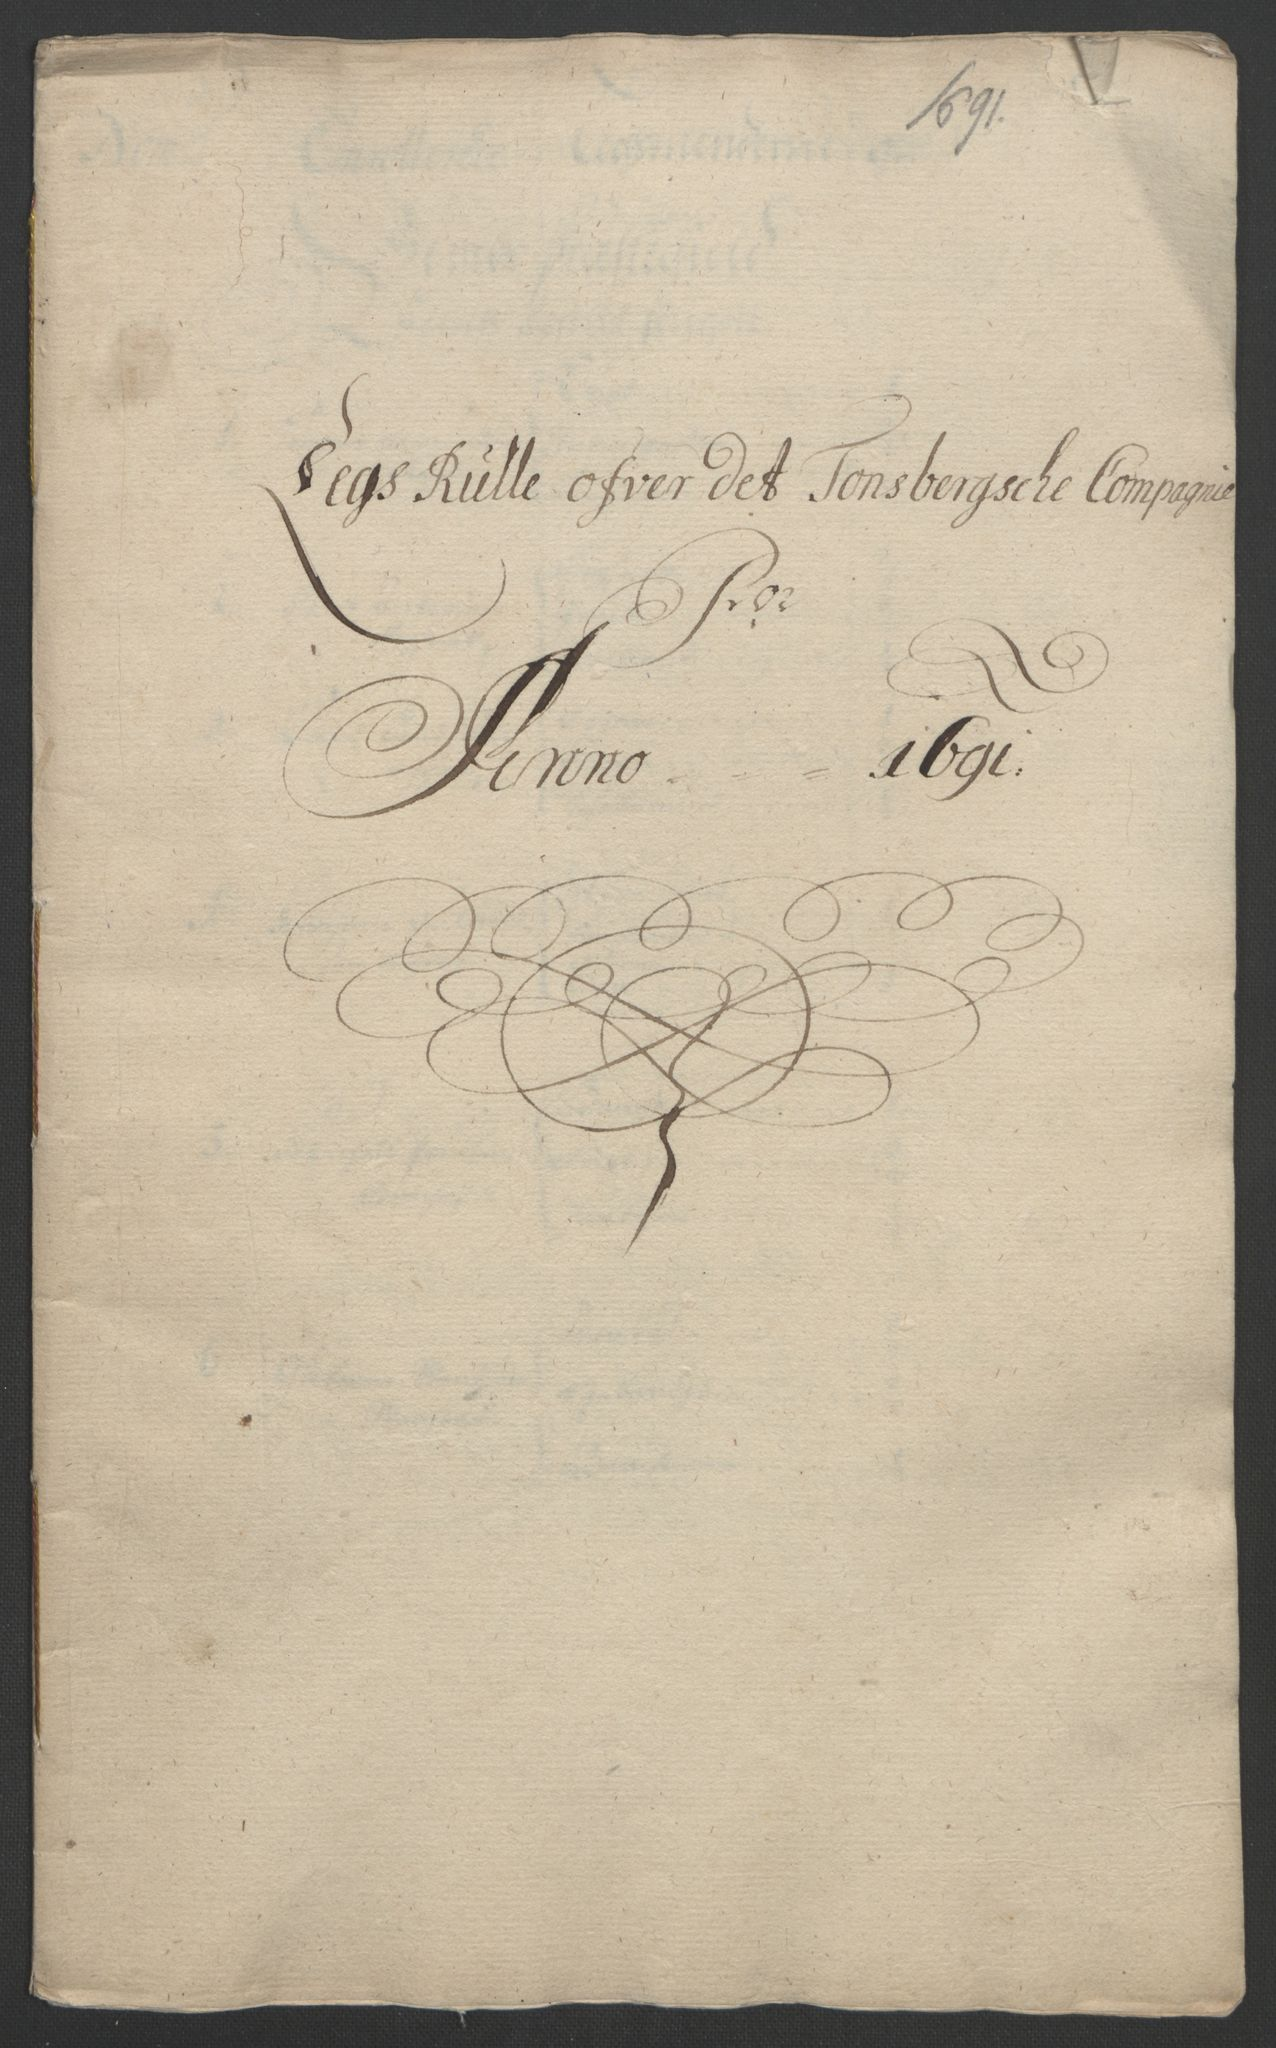 RA, Rentekammeret inntil 1814, Reviderte regnskaper, Fogderegnskap, R32/L1864: Fogderegnskap Jarlsberg grevskap, 1691, s. 75